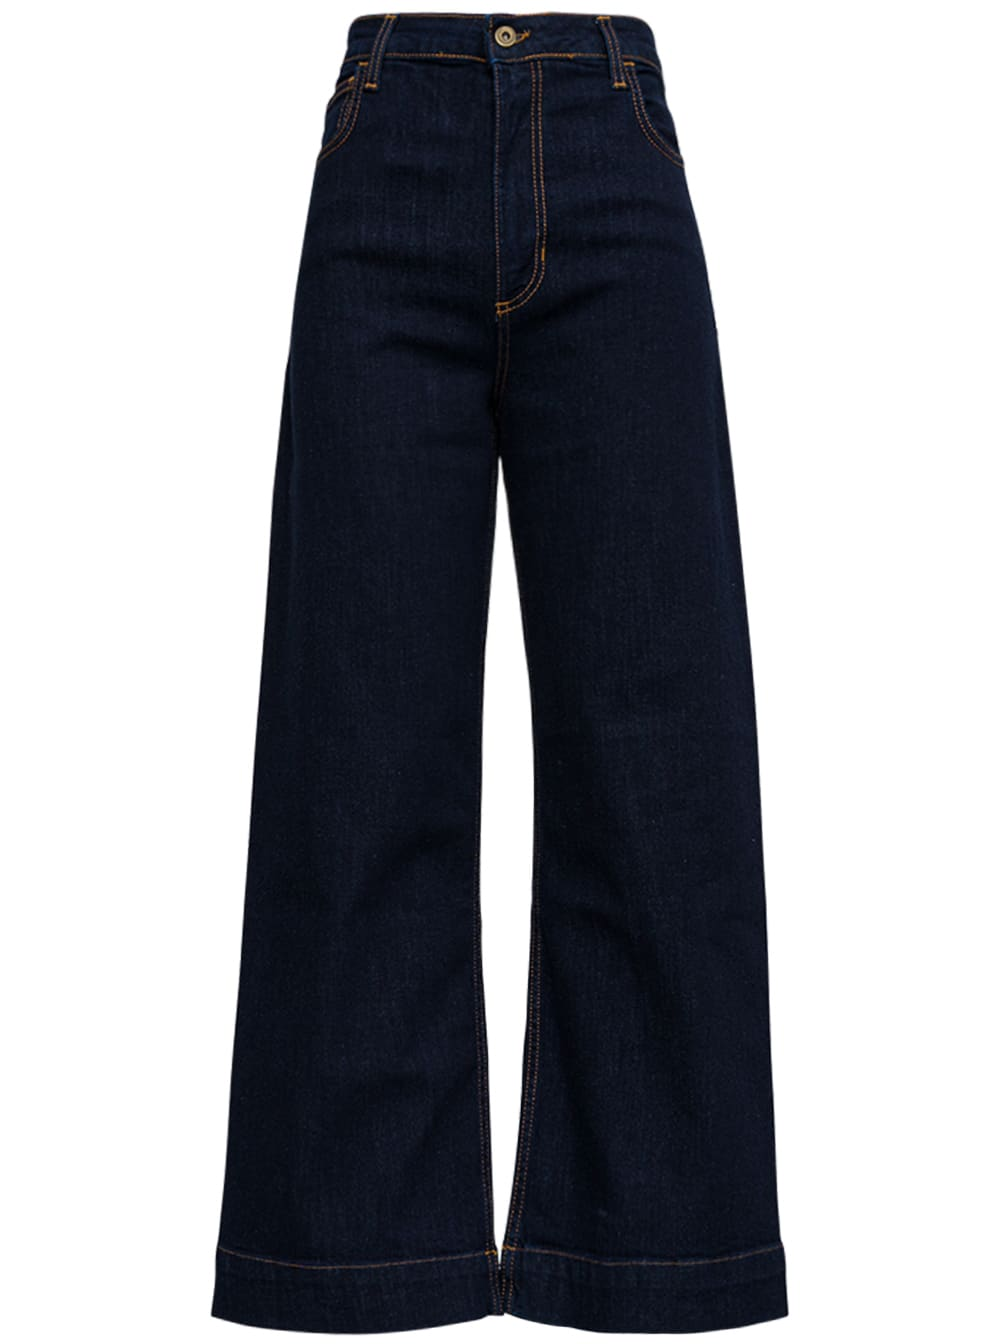 Wide Leg Blue Denim Jeans